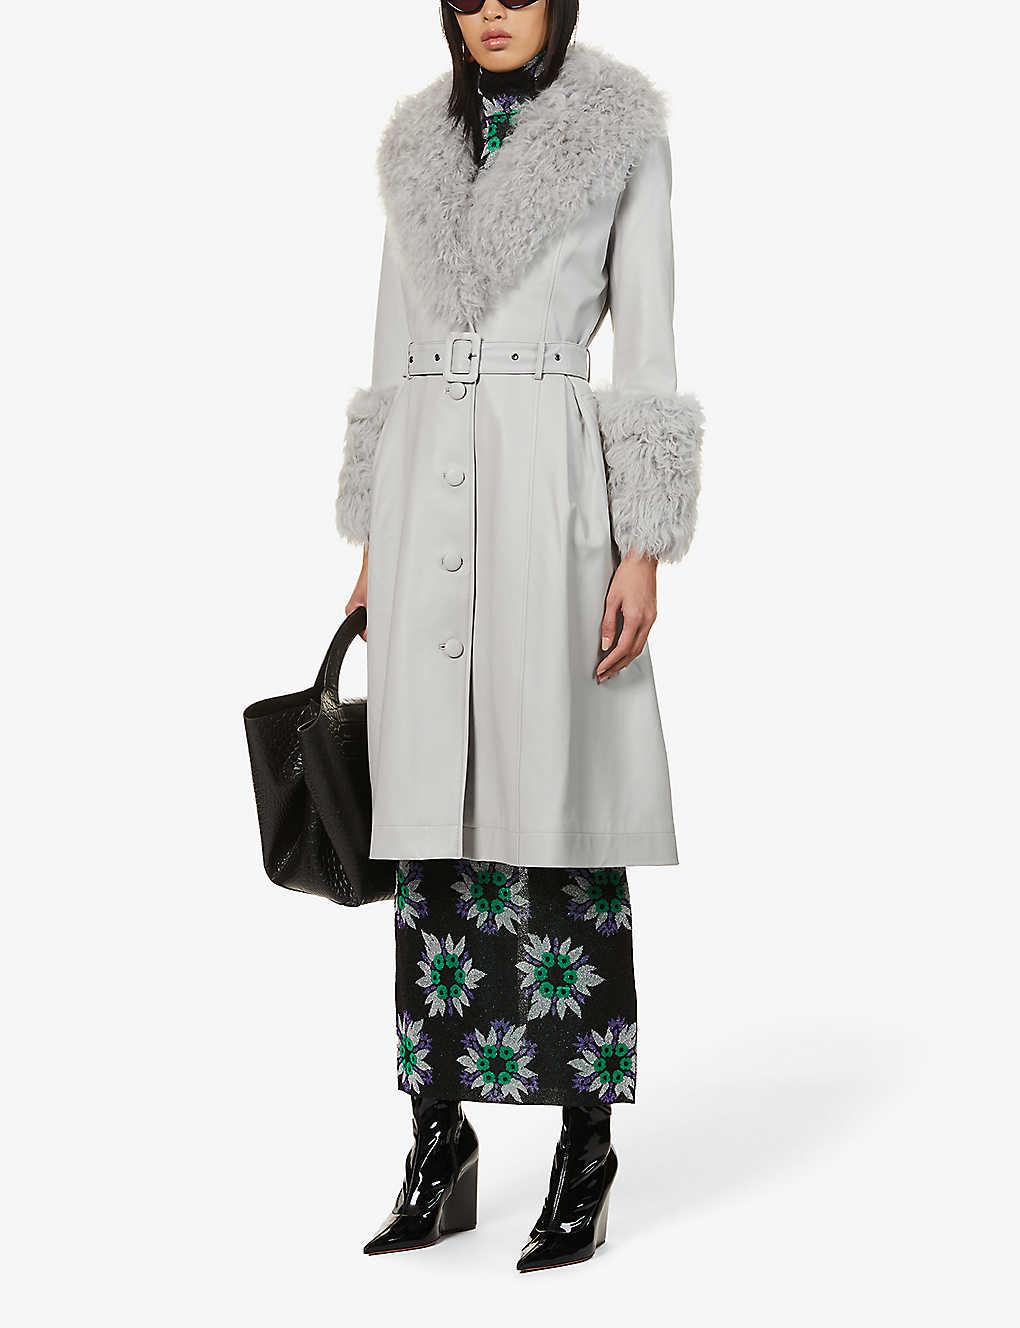 SAKS POTTS Foxy V-neck shearling-trimmed leather coat in Gray